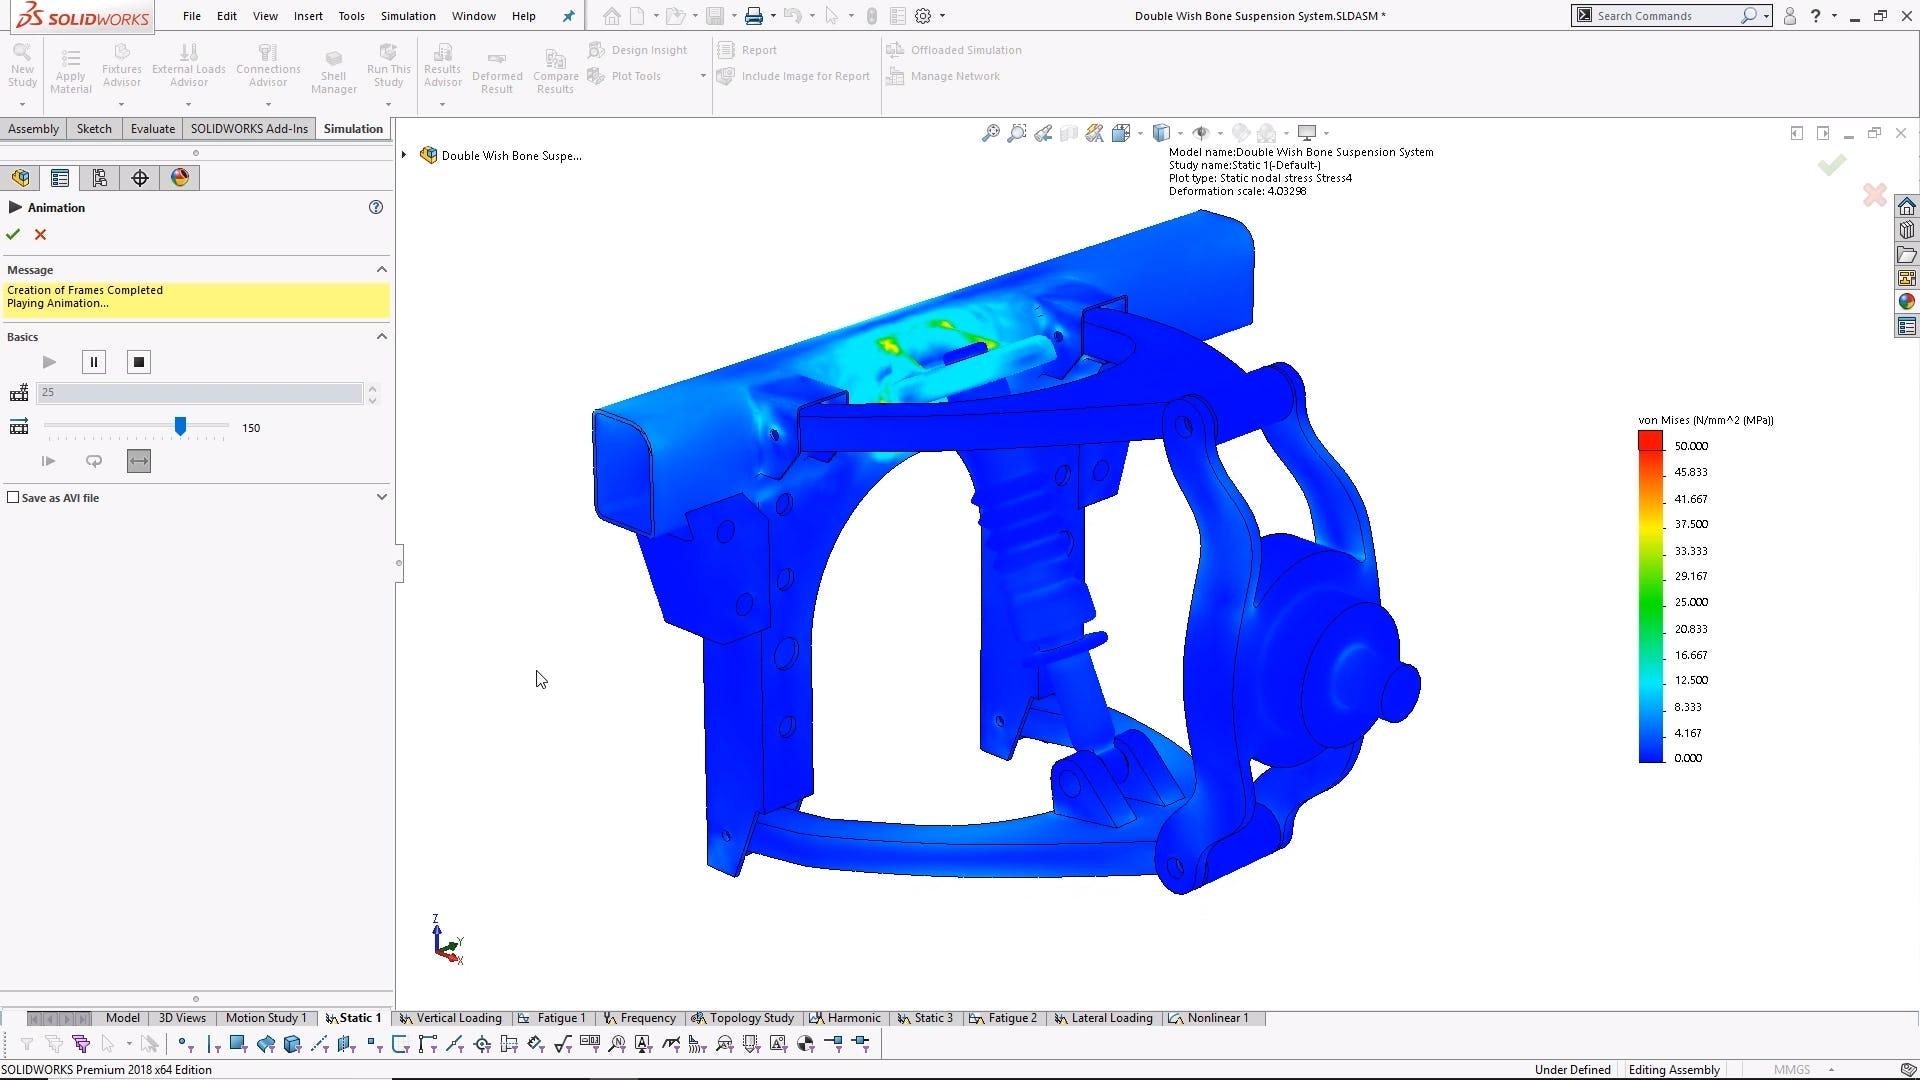 SolidWorks Premium Software - 4